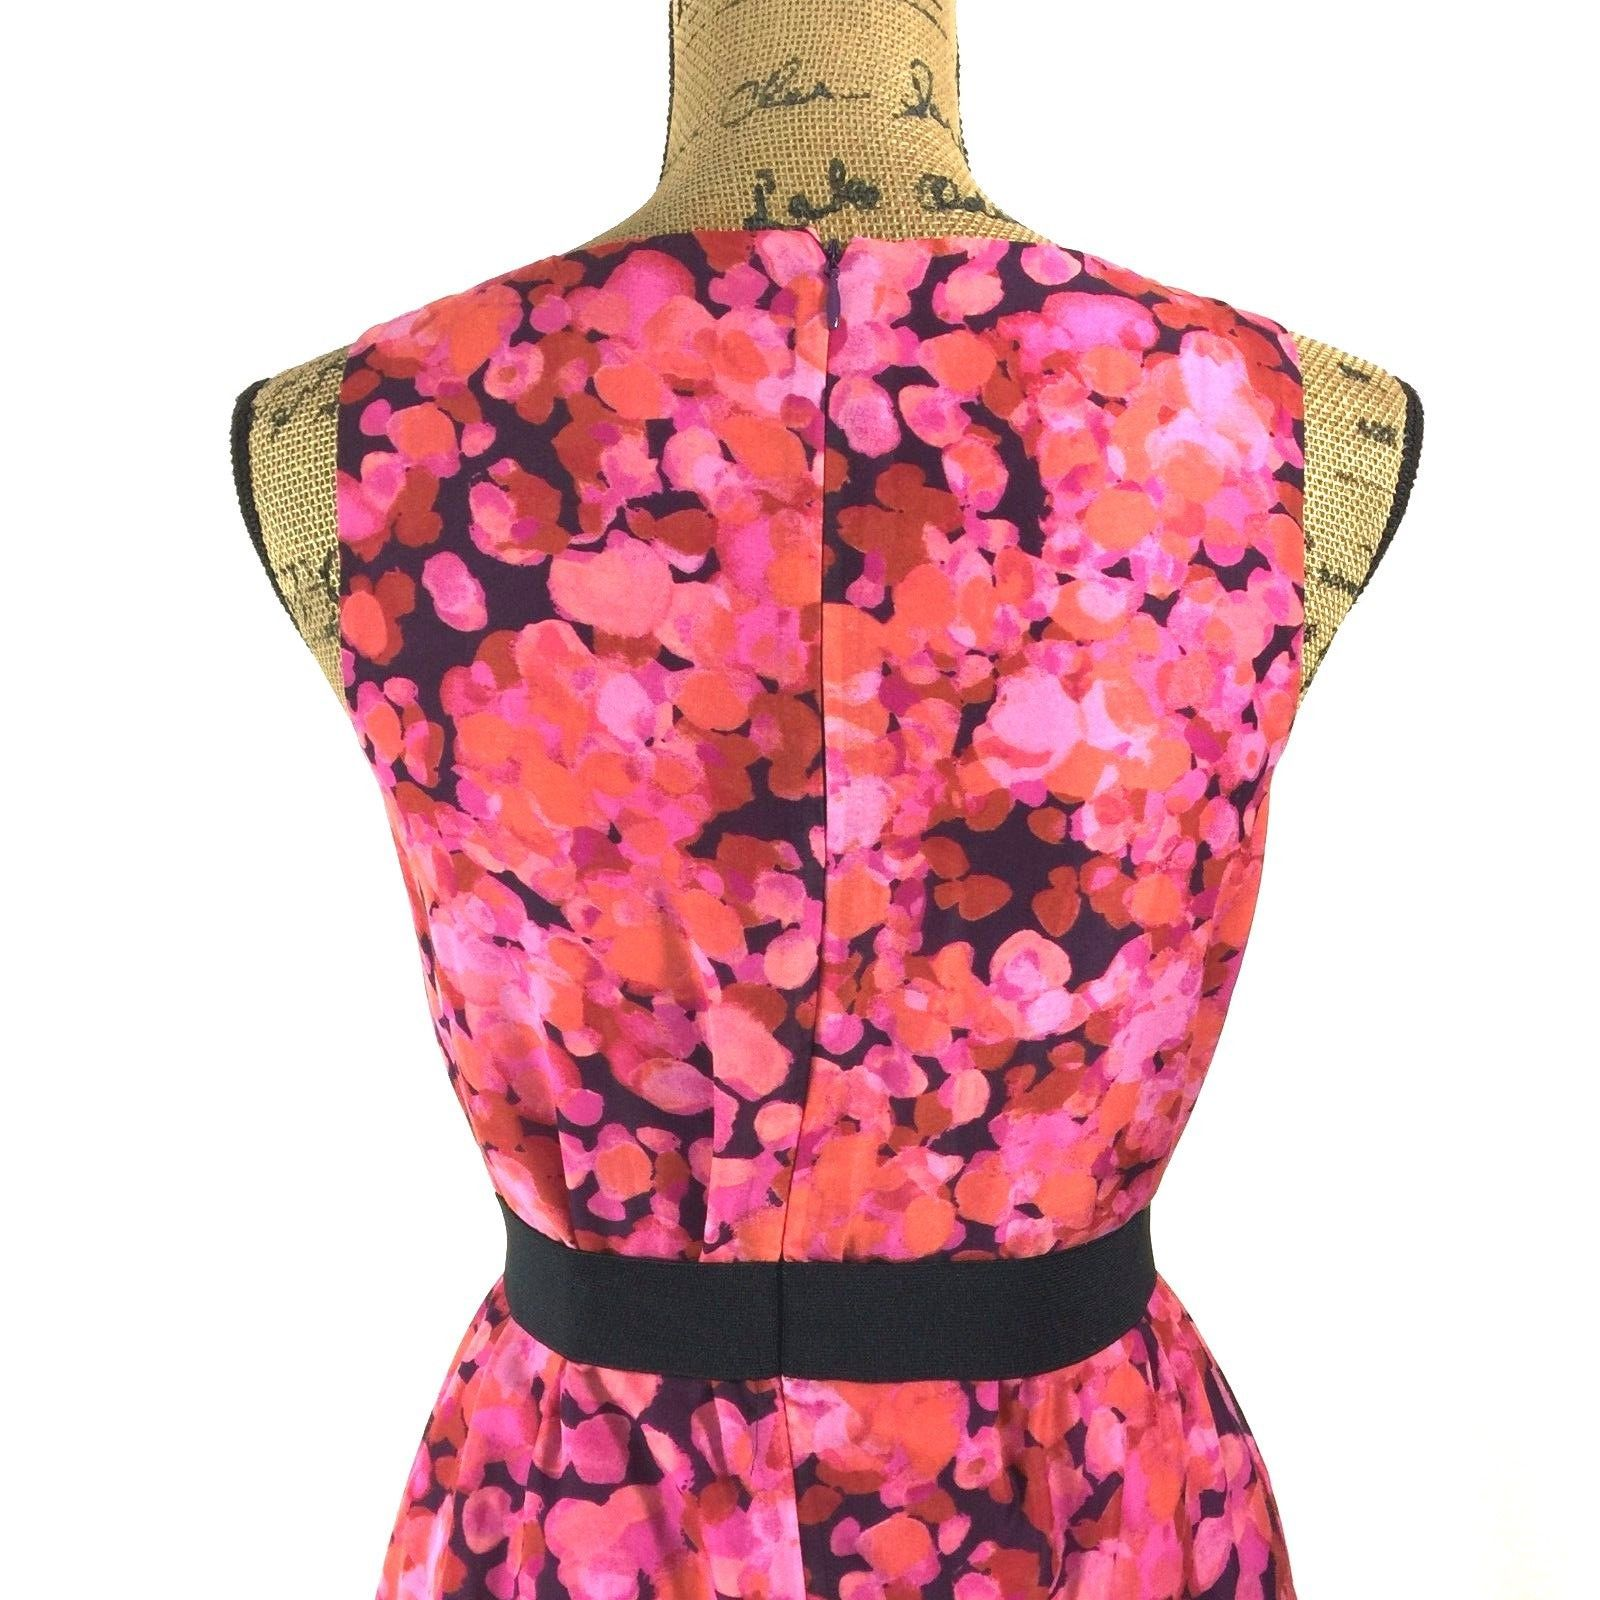 SET Ann Taylor LOFT Dress J.Crew Clare Cardigan Sweater Pink Purple Black 2 S LN image 6